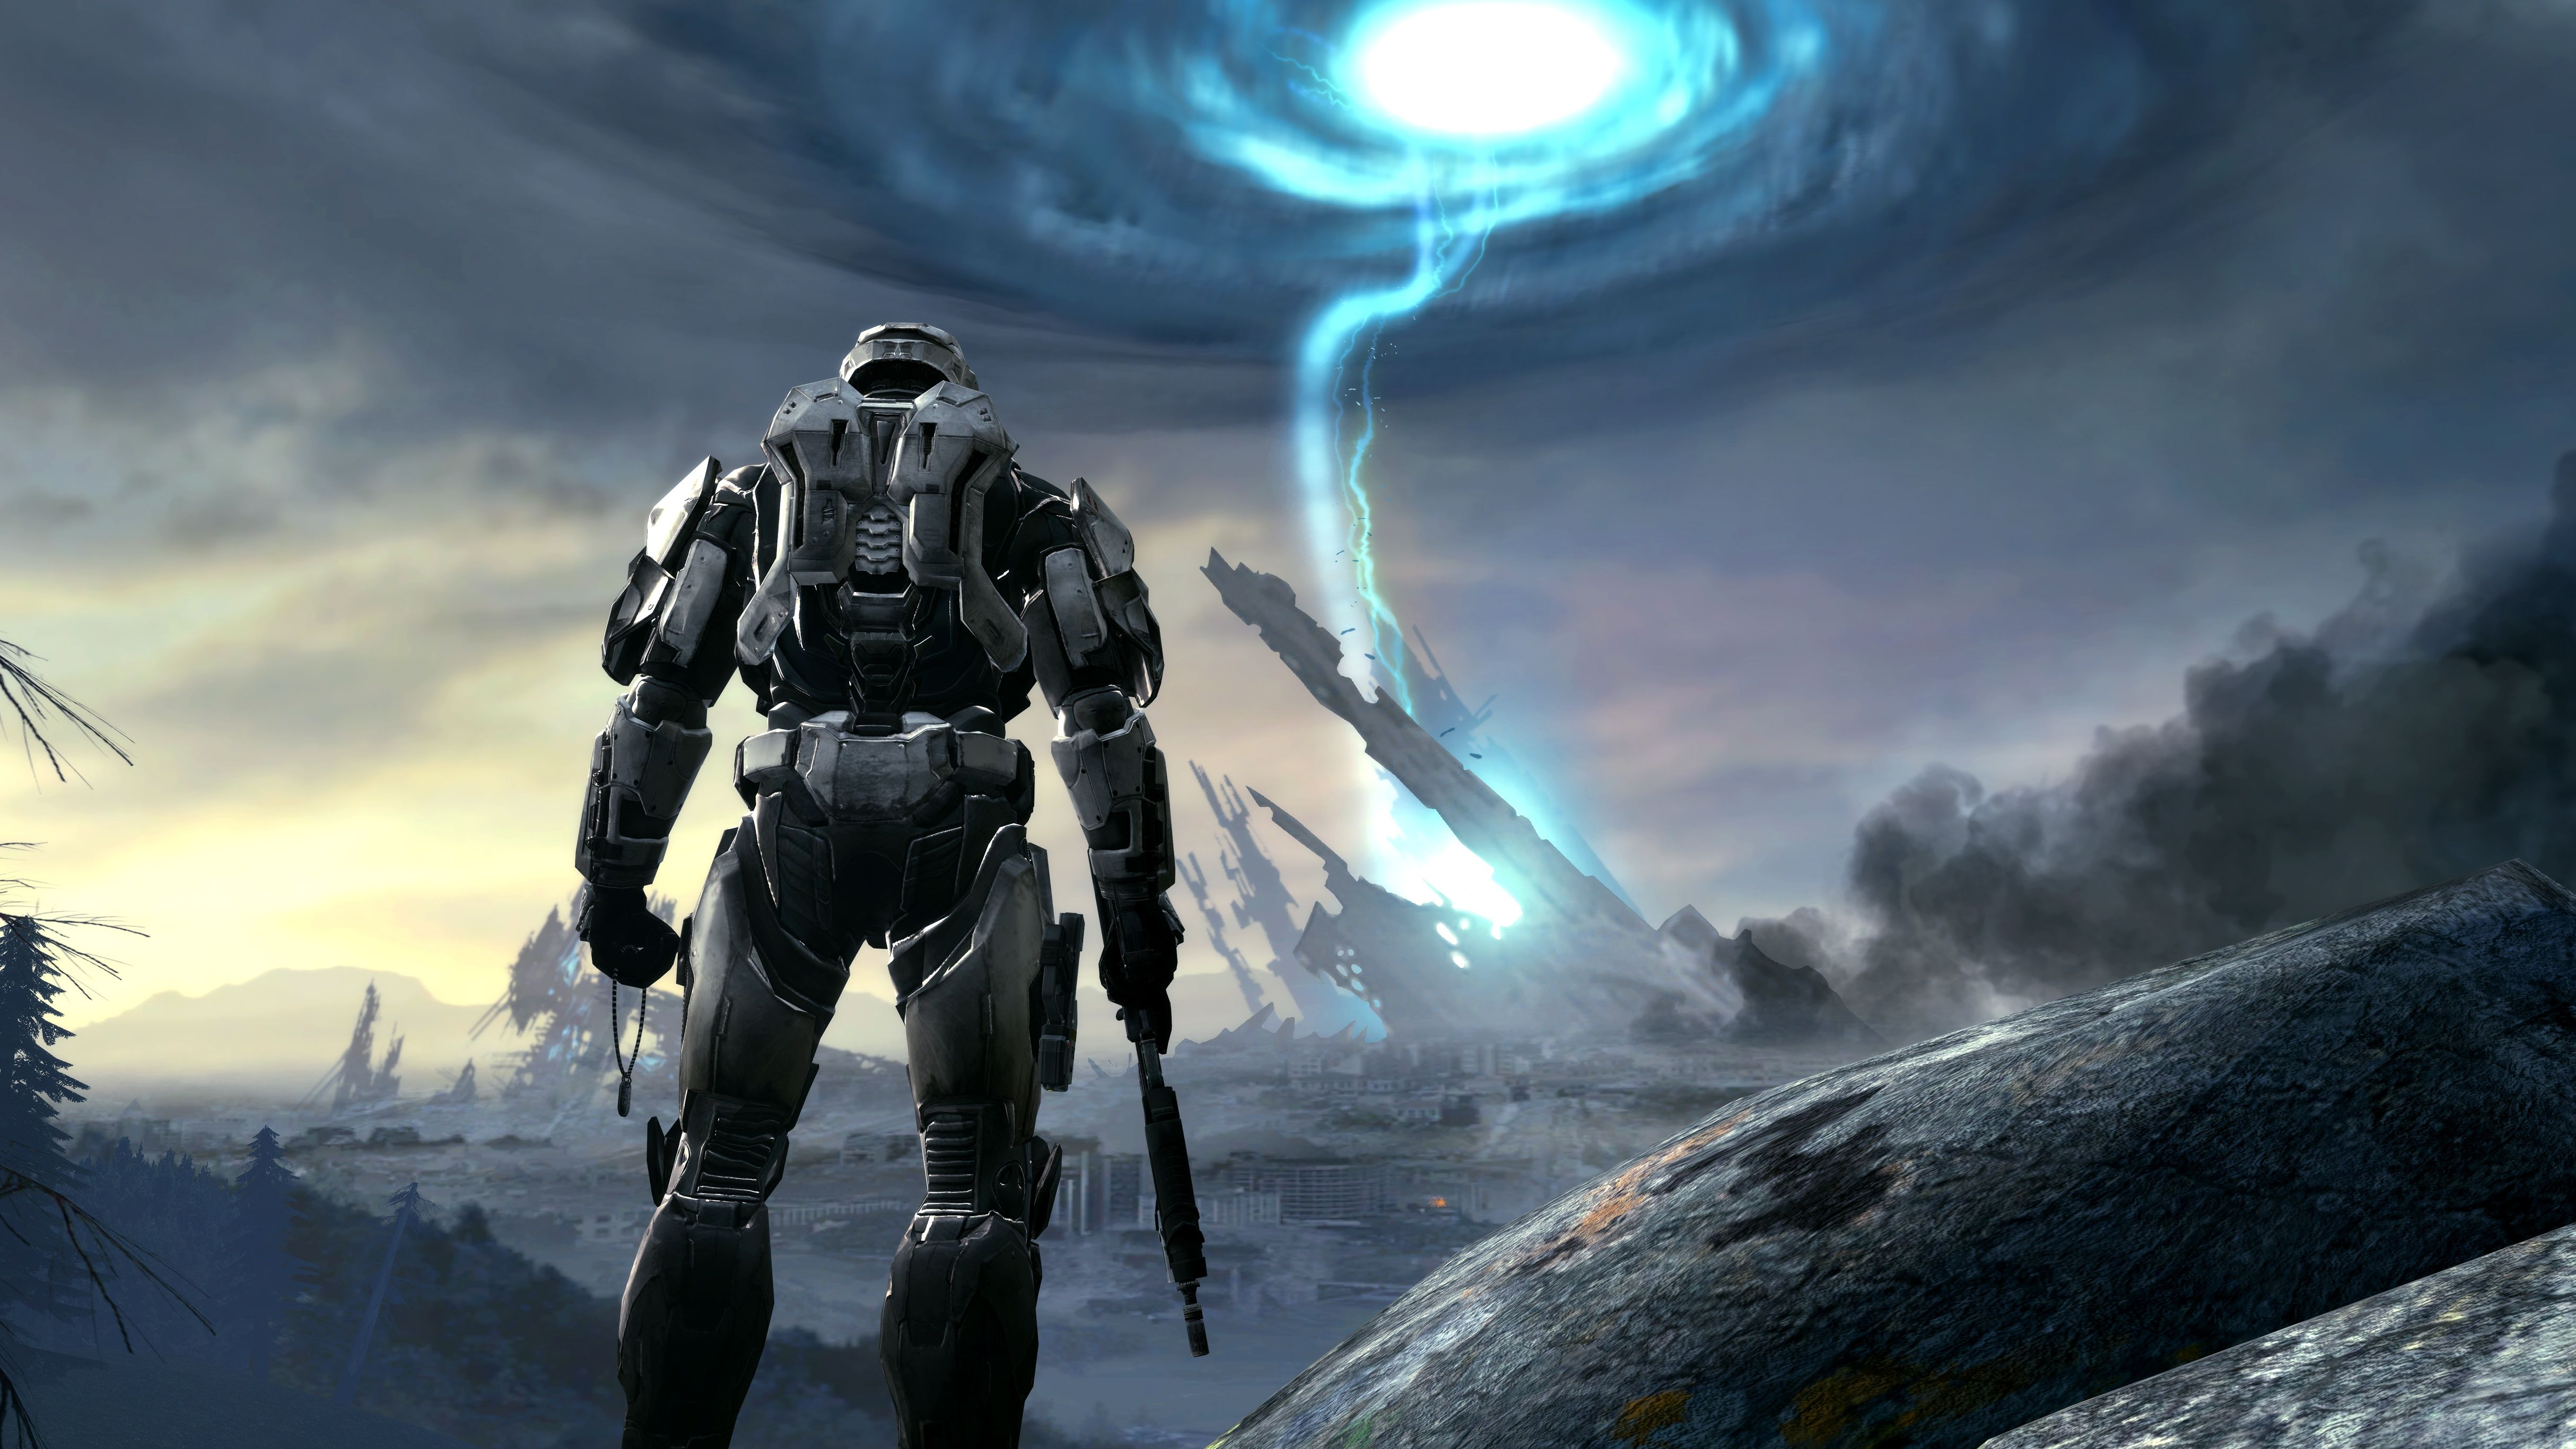 Halo Game Artwork In 4k Hq Wallpaper Portal Creative Halo Game Gaming Wallpapers Hd Halo